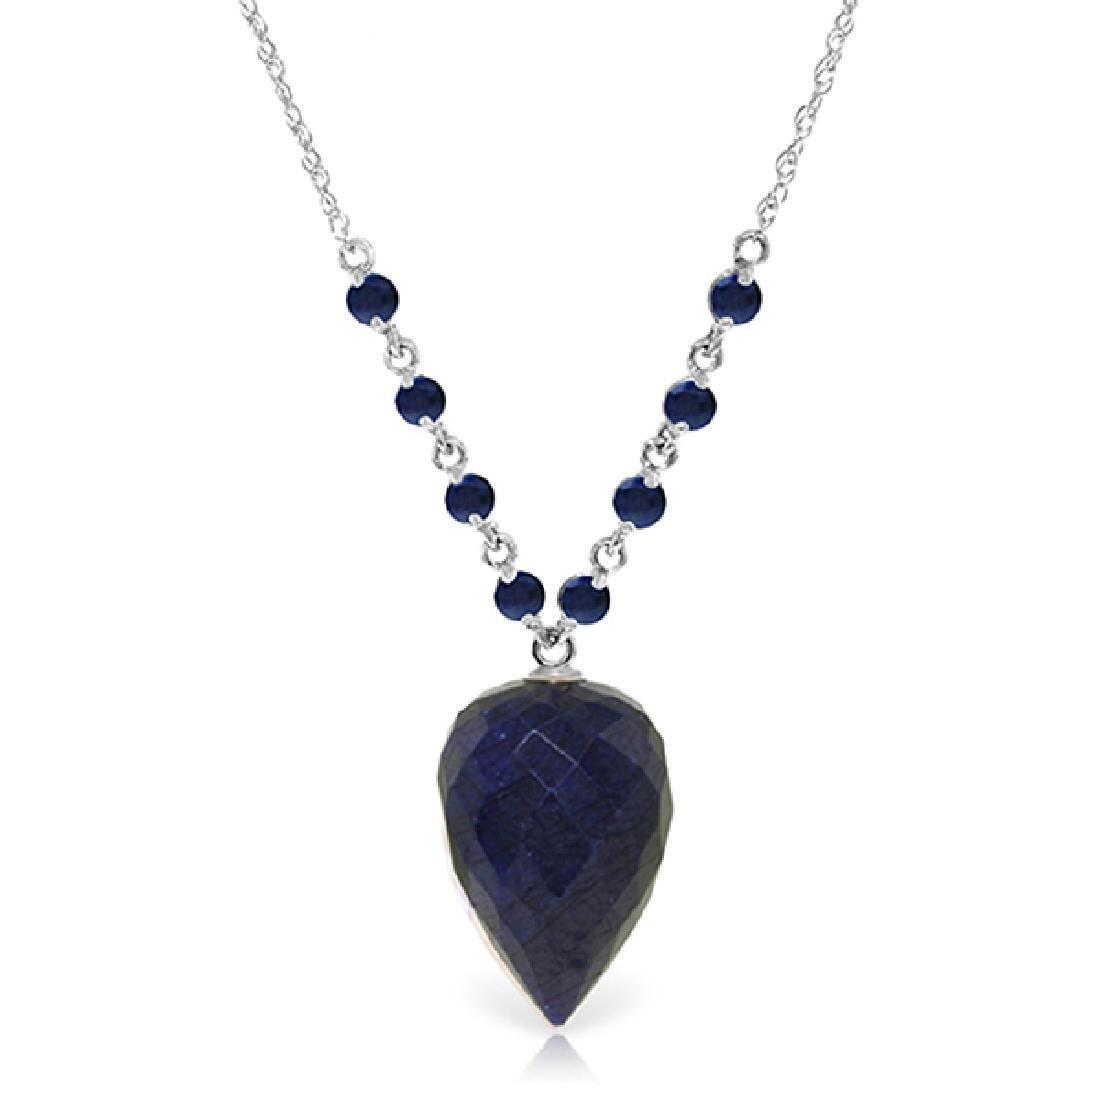 Genuine 14 ctw Sapphire Necklace Jewelry 14KT White